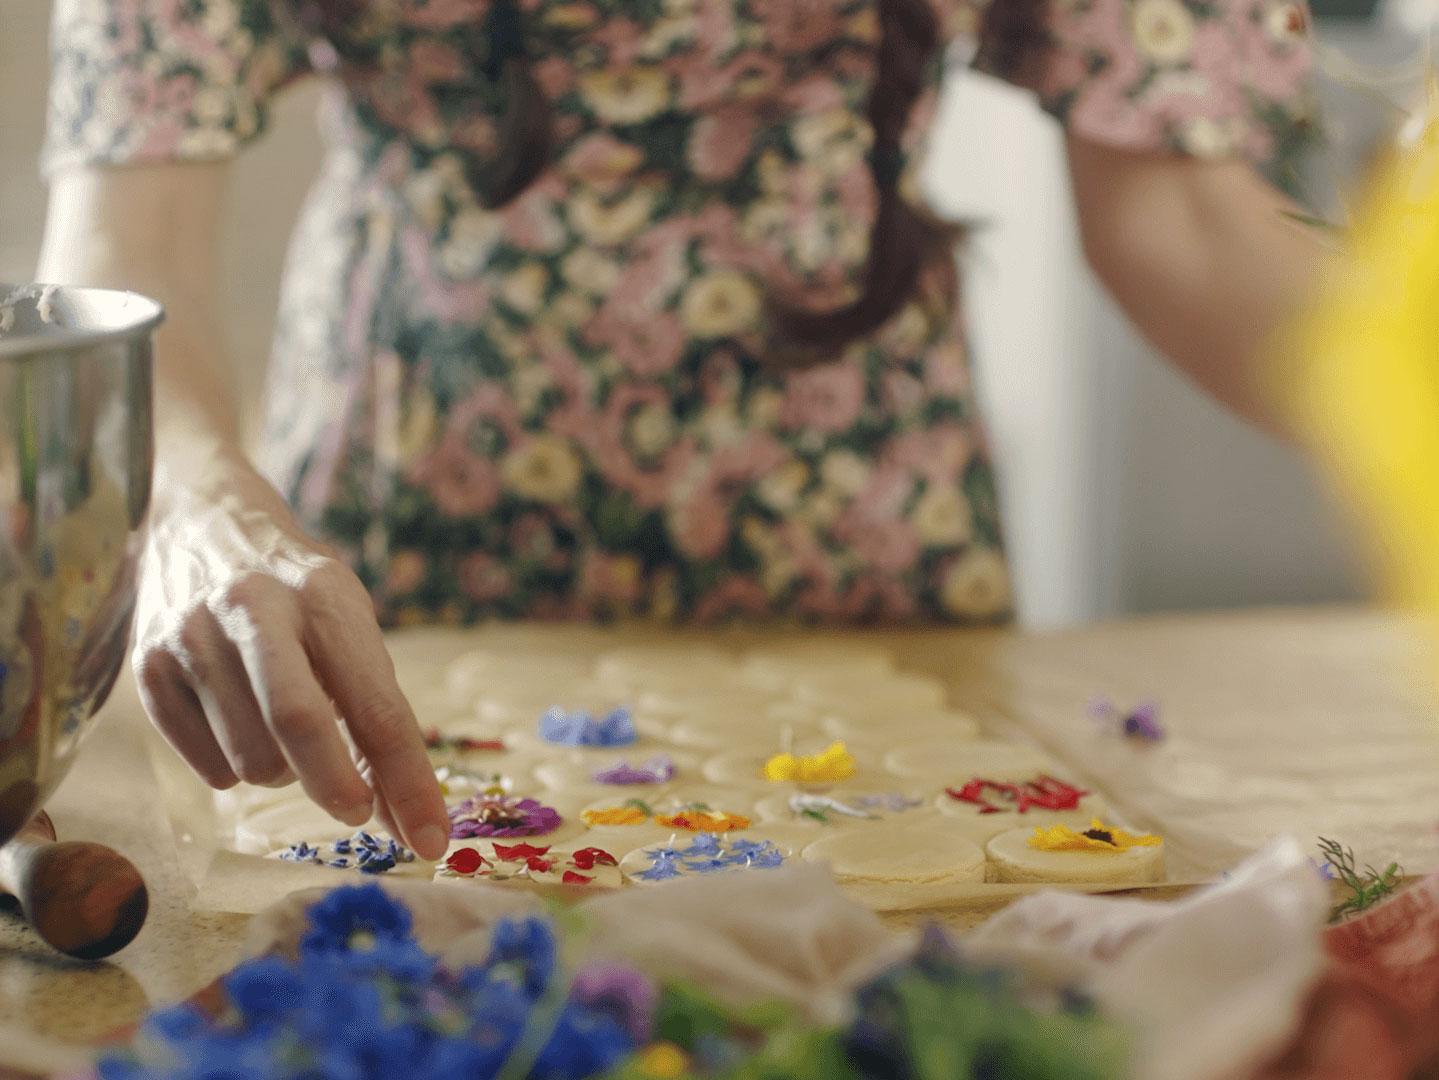 Loria Stern pressing edible flowers into cookies.